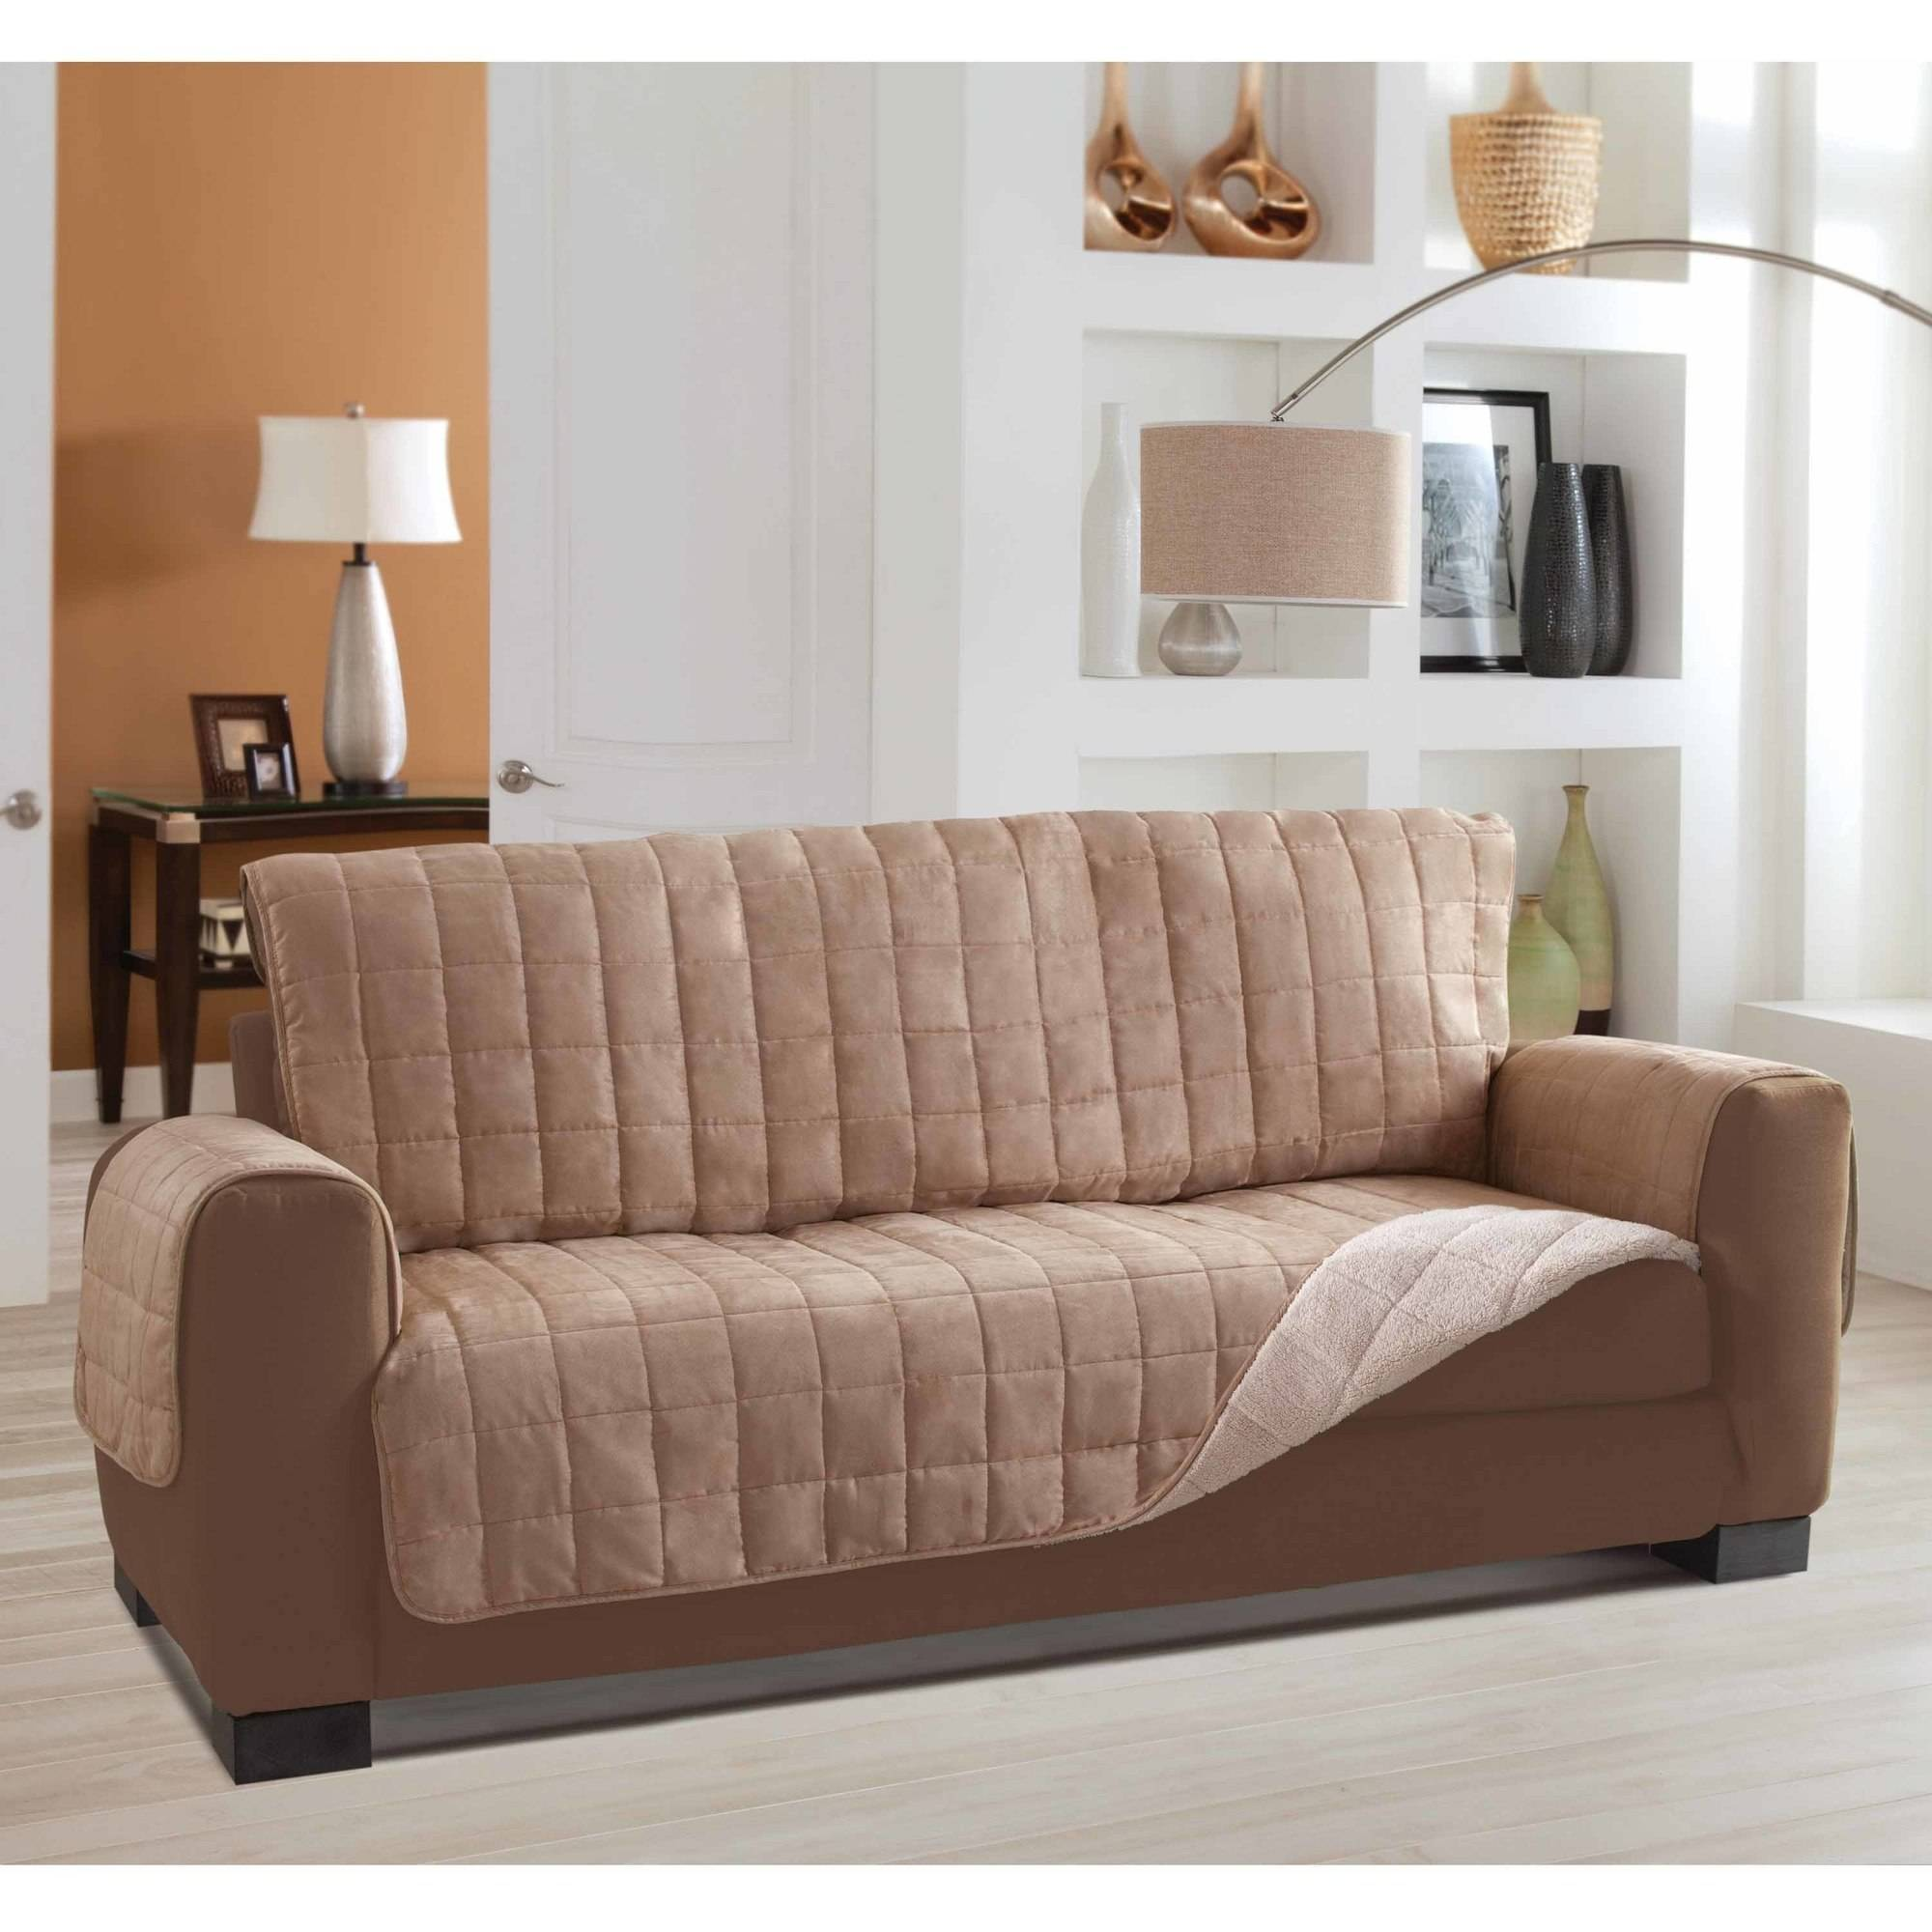 Serta Living Room Furniture Serta Reversible Sherpa Suede Furniture Protector Sofa Walmartcom